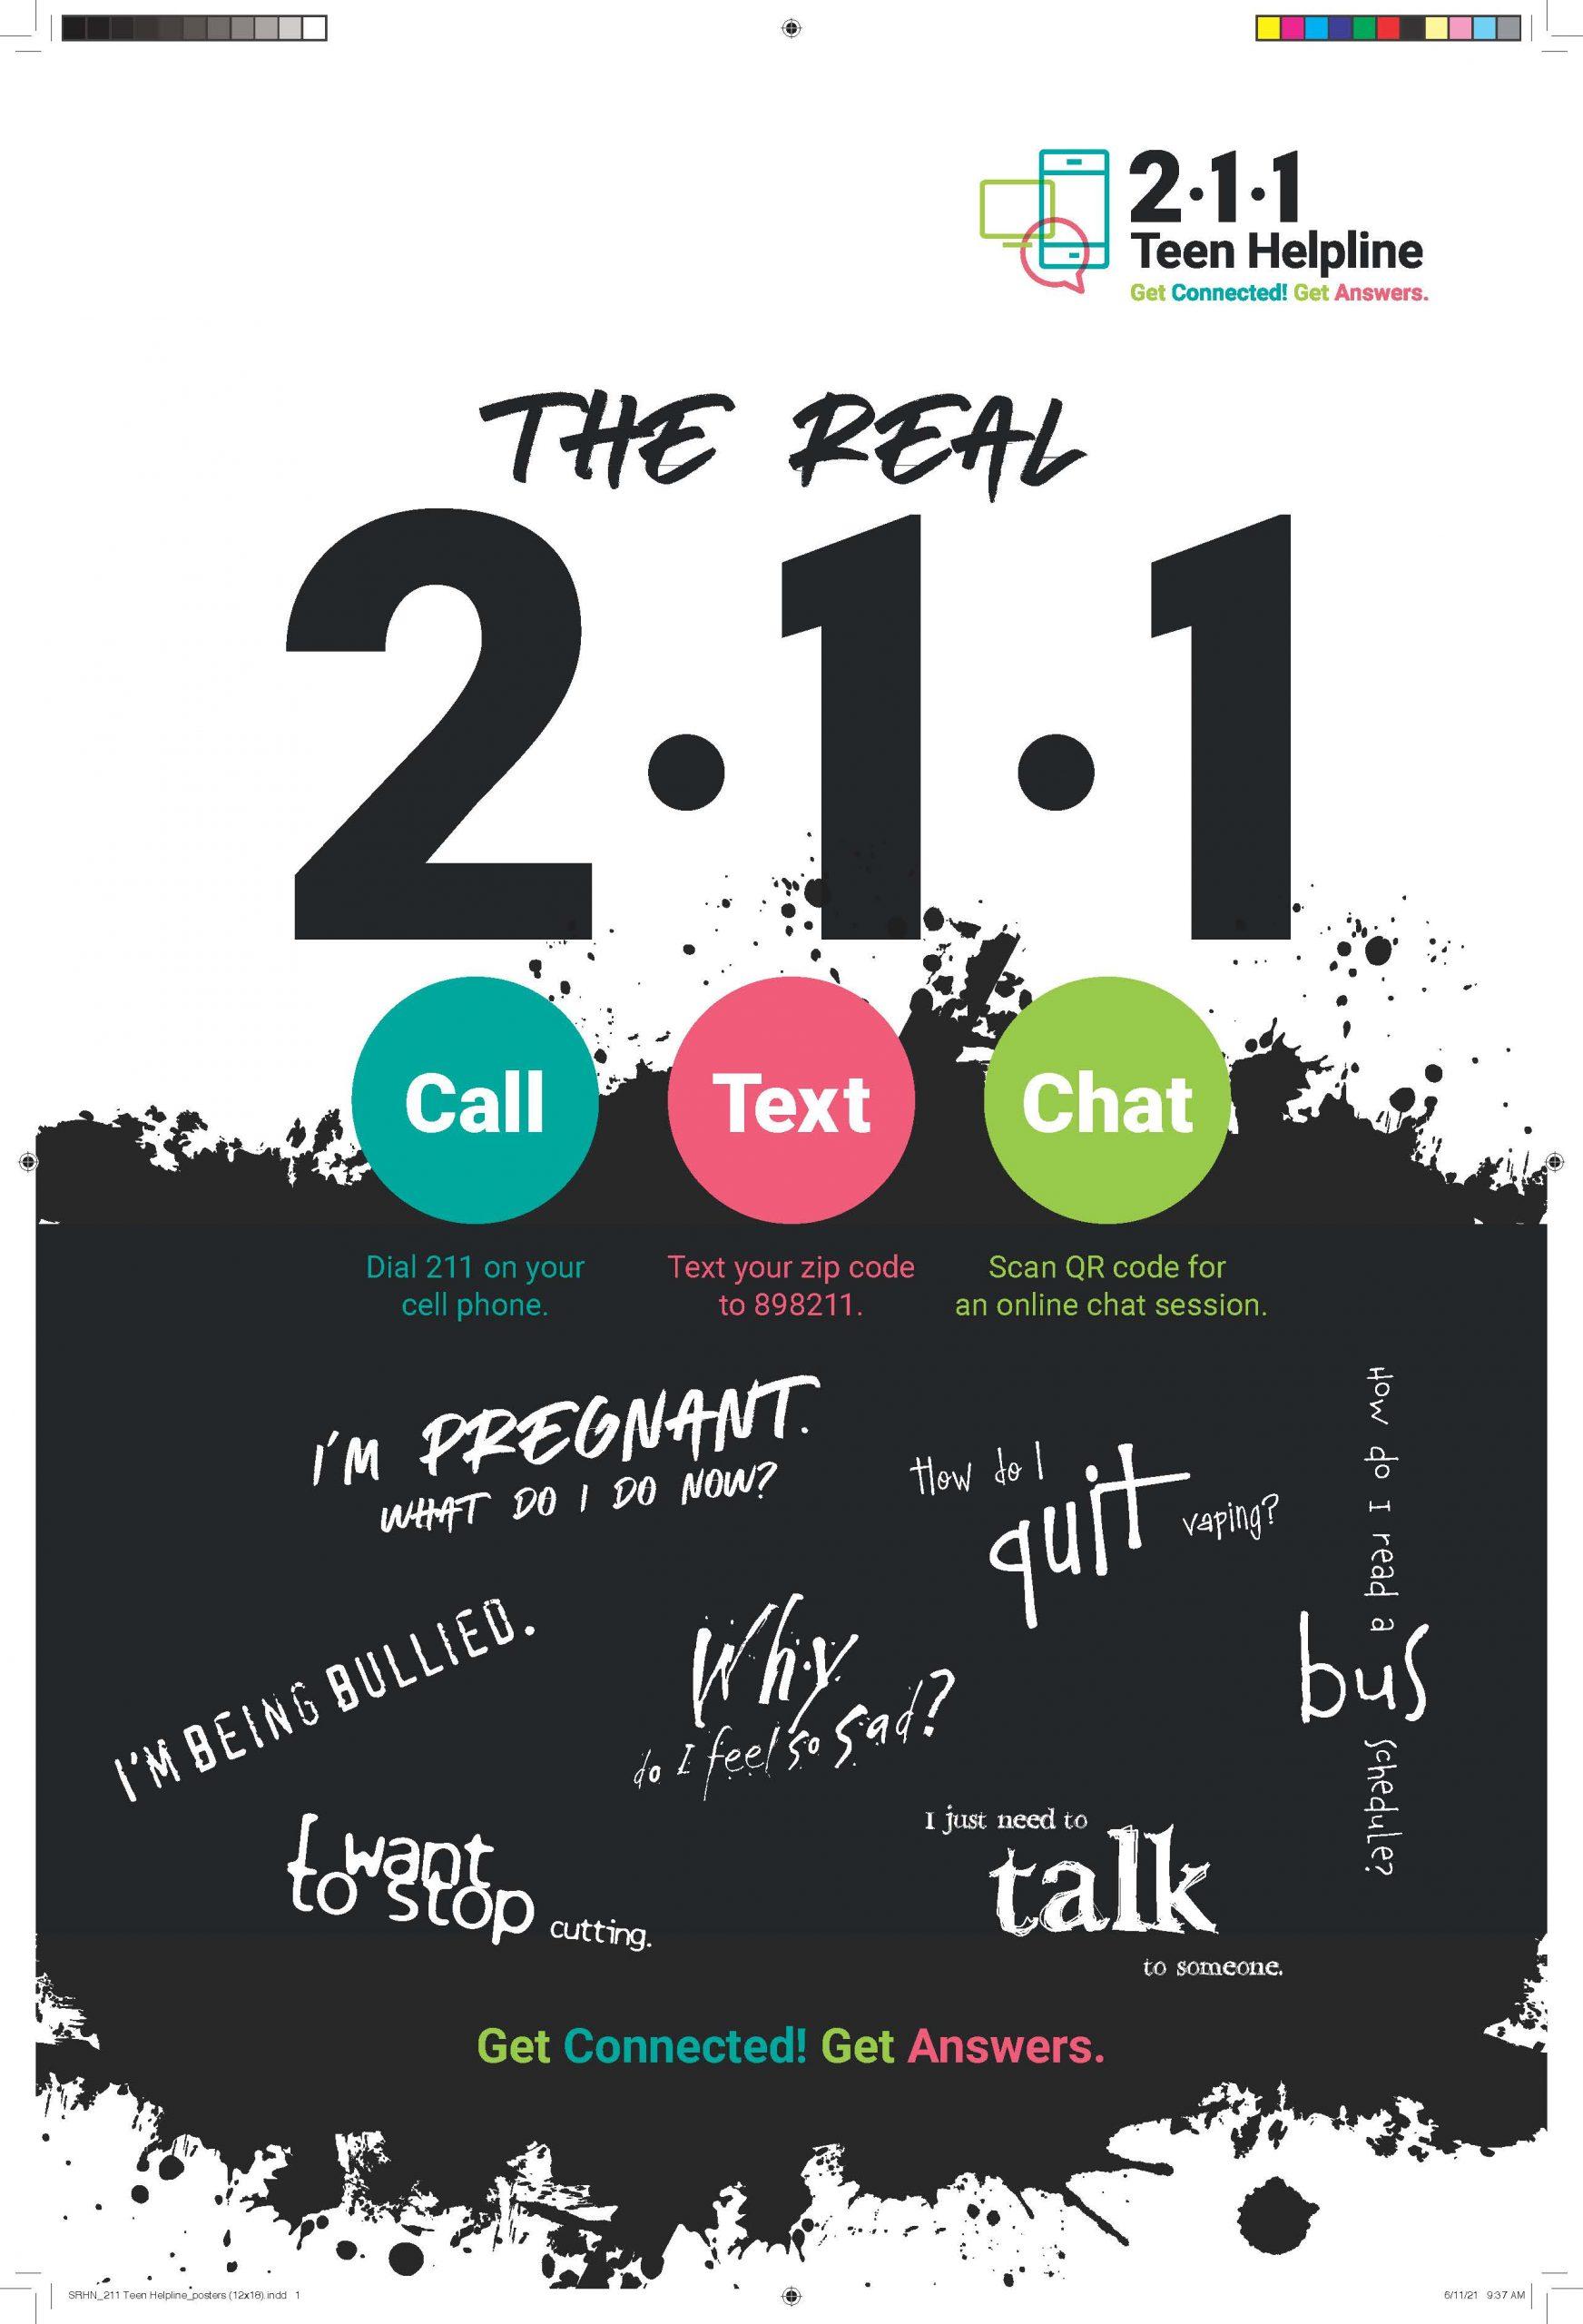 SRHN 211 Teen Helpline posters 12x18 press Page 01 scaled - 2-1-1 Teen Helpline